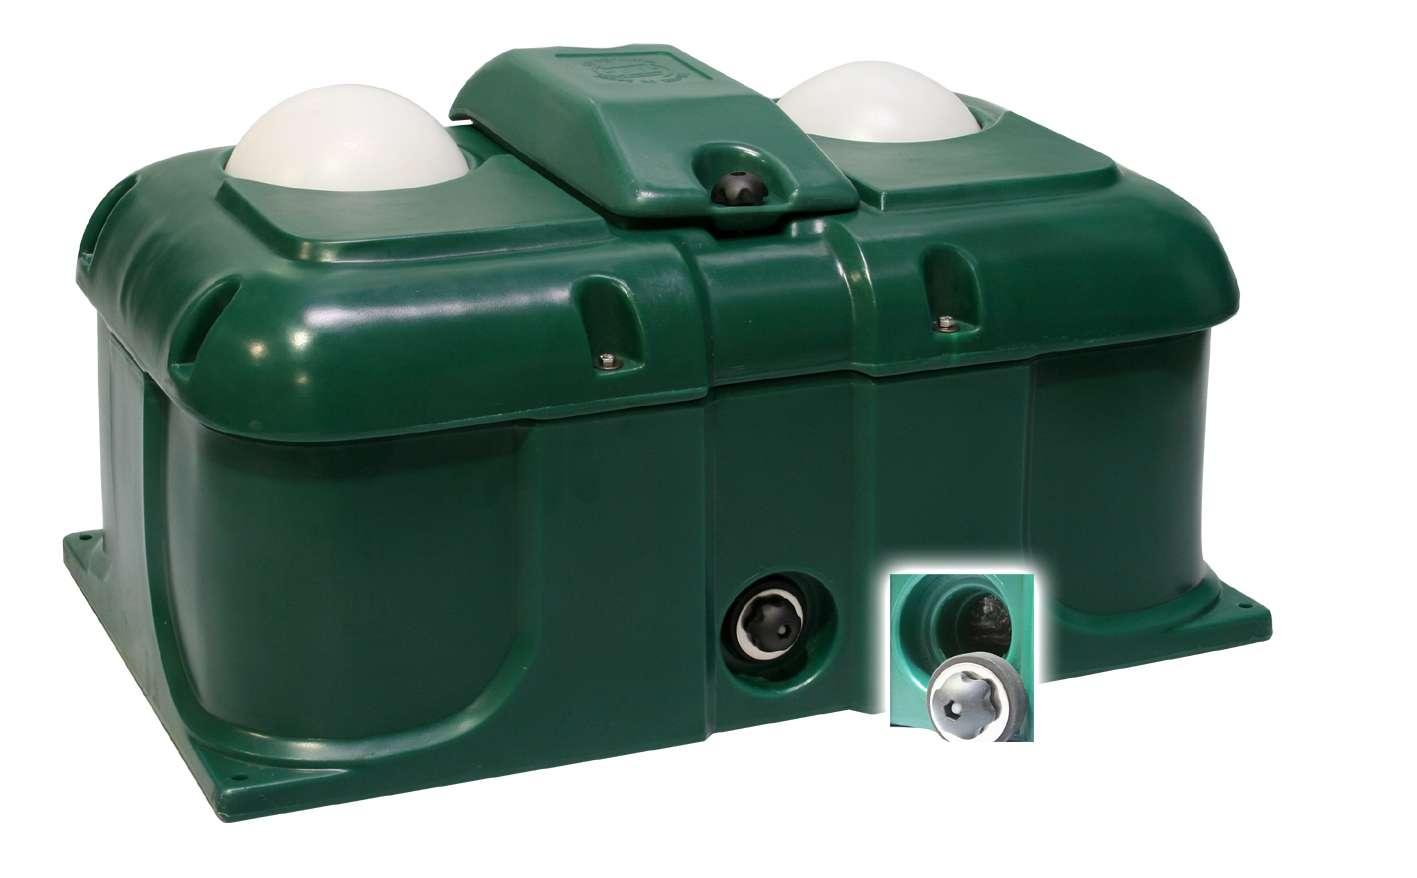 Frostfreie Thermotränke 80 Liter | Agrar Fachversand